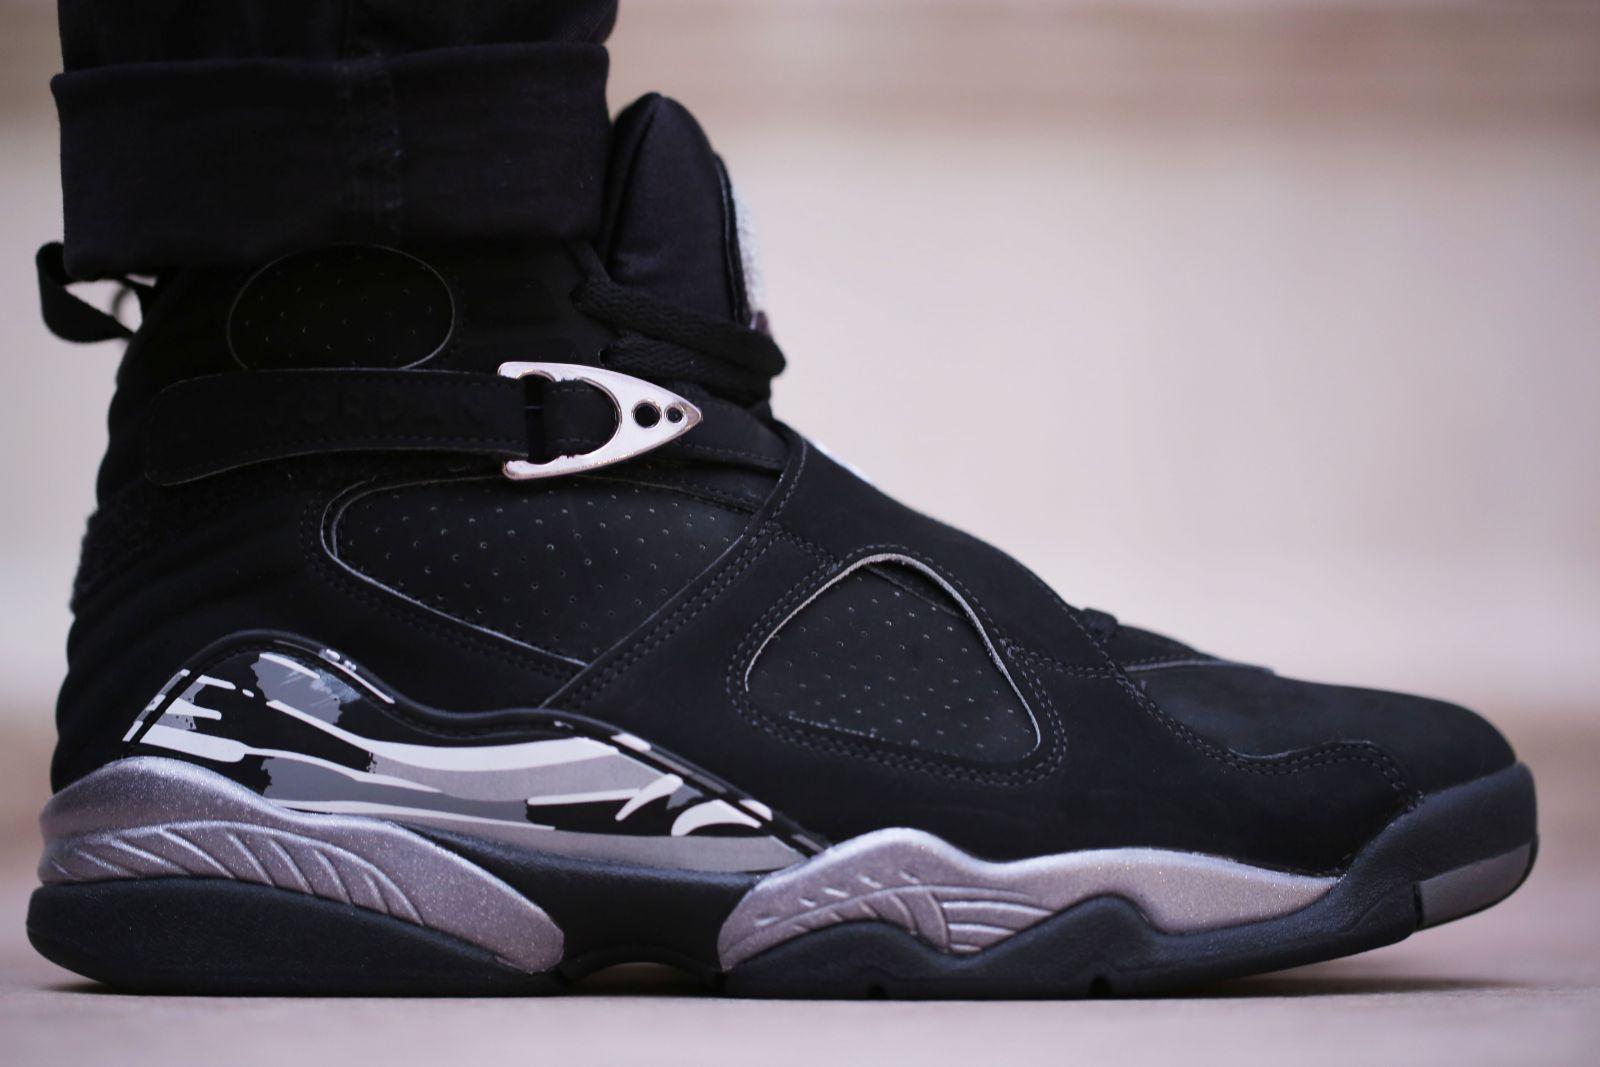 See How the Holiday 2015 Air Jordan Retros Look On-Feet. Chromes ... 8beced0d5